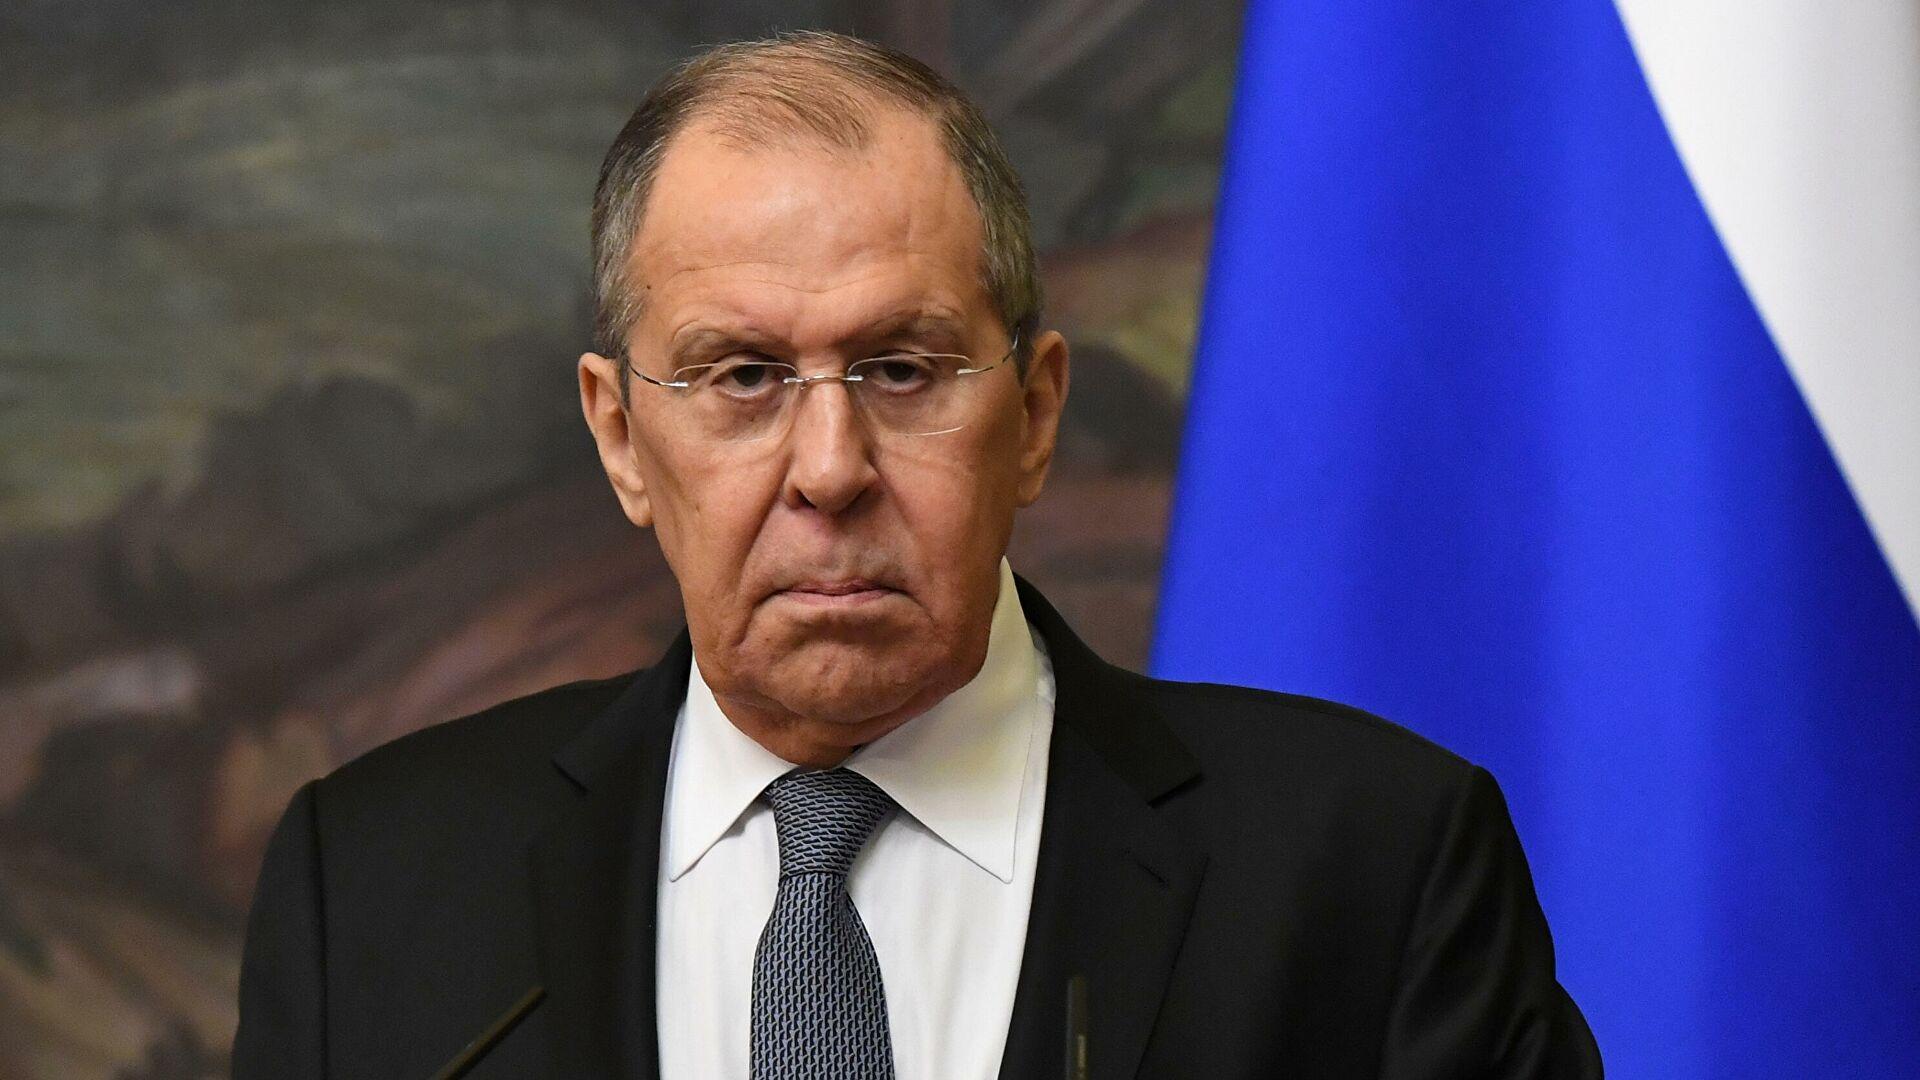 Lavrov: Ako bi reagovali na sva saopštenja iz Kijeva, čak ni fikcija ne bi bila dovoljna da sve to pokrije